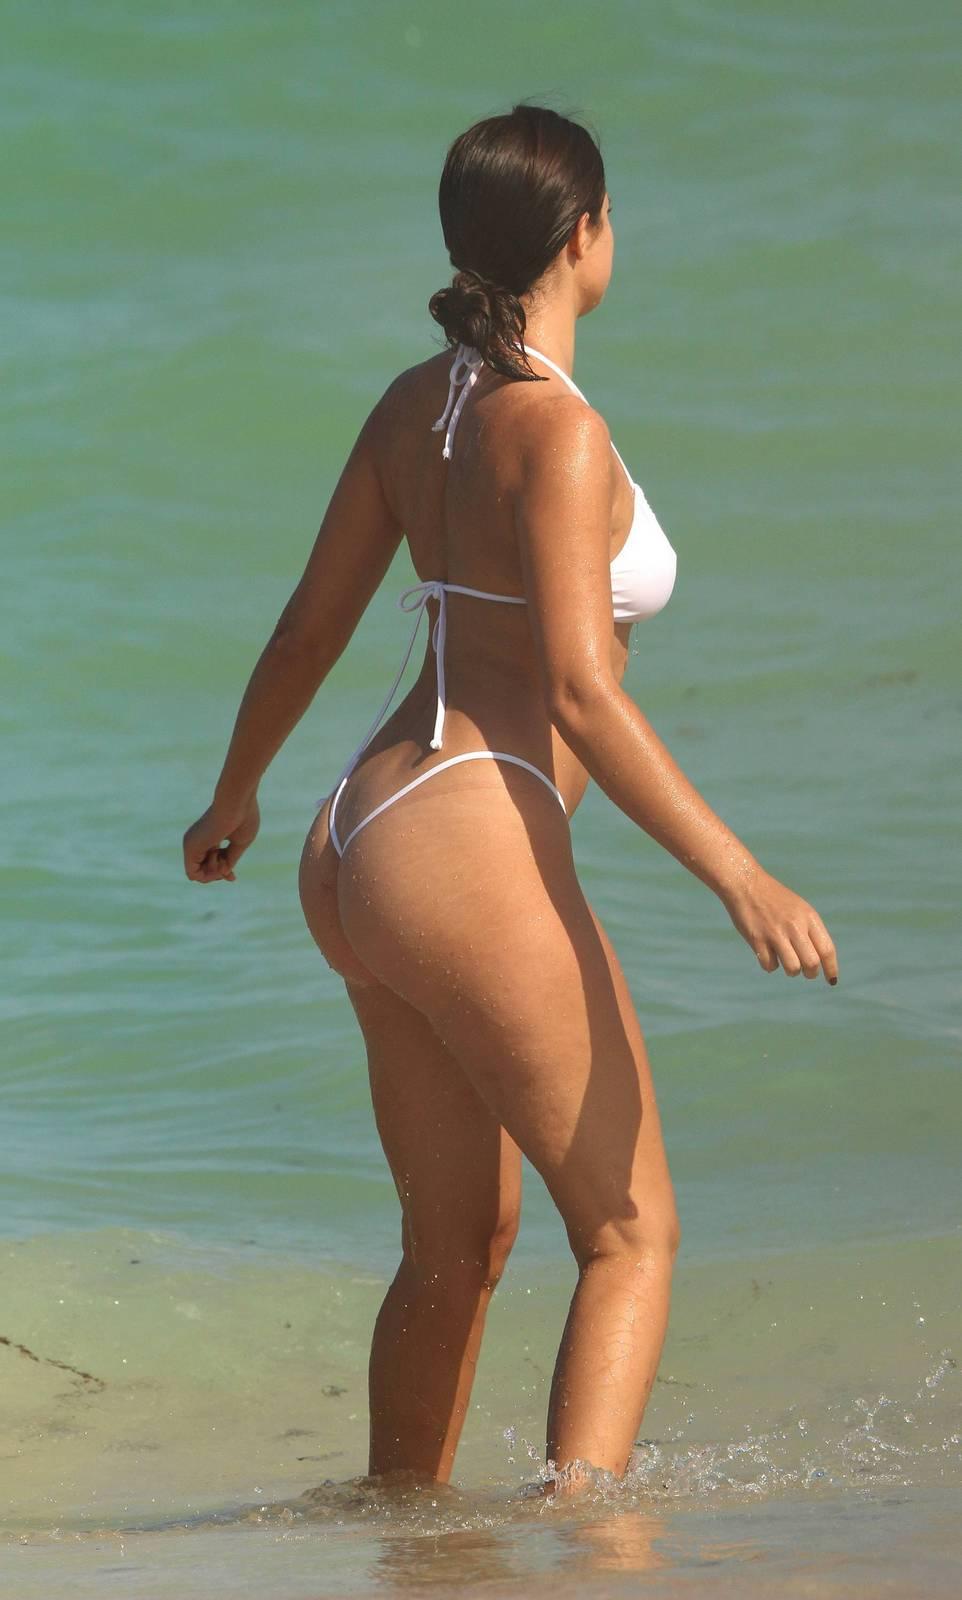 Tao Wickrath - In a bikini (Miami)